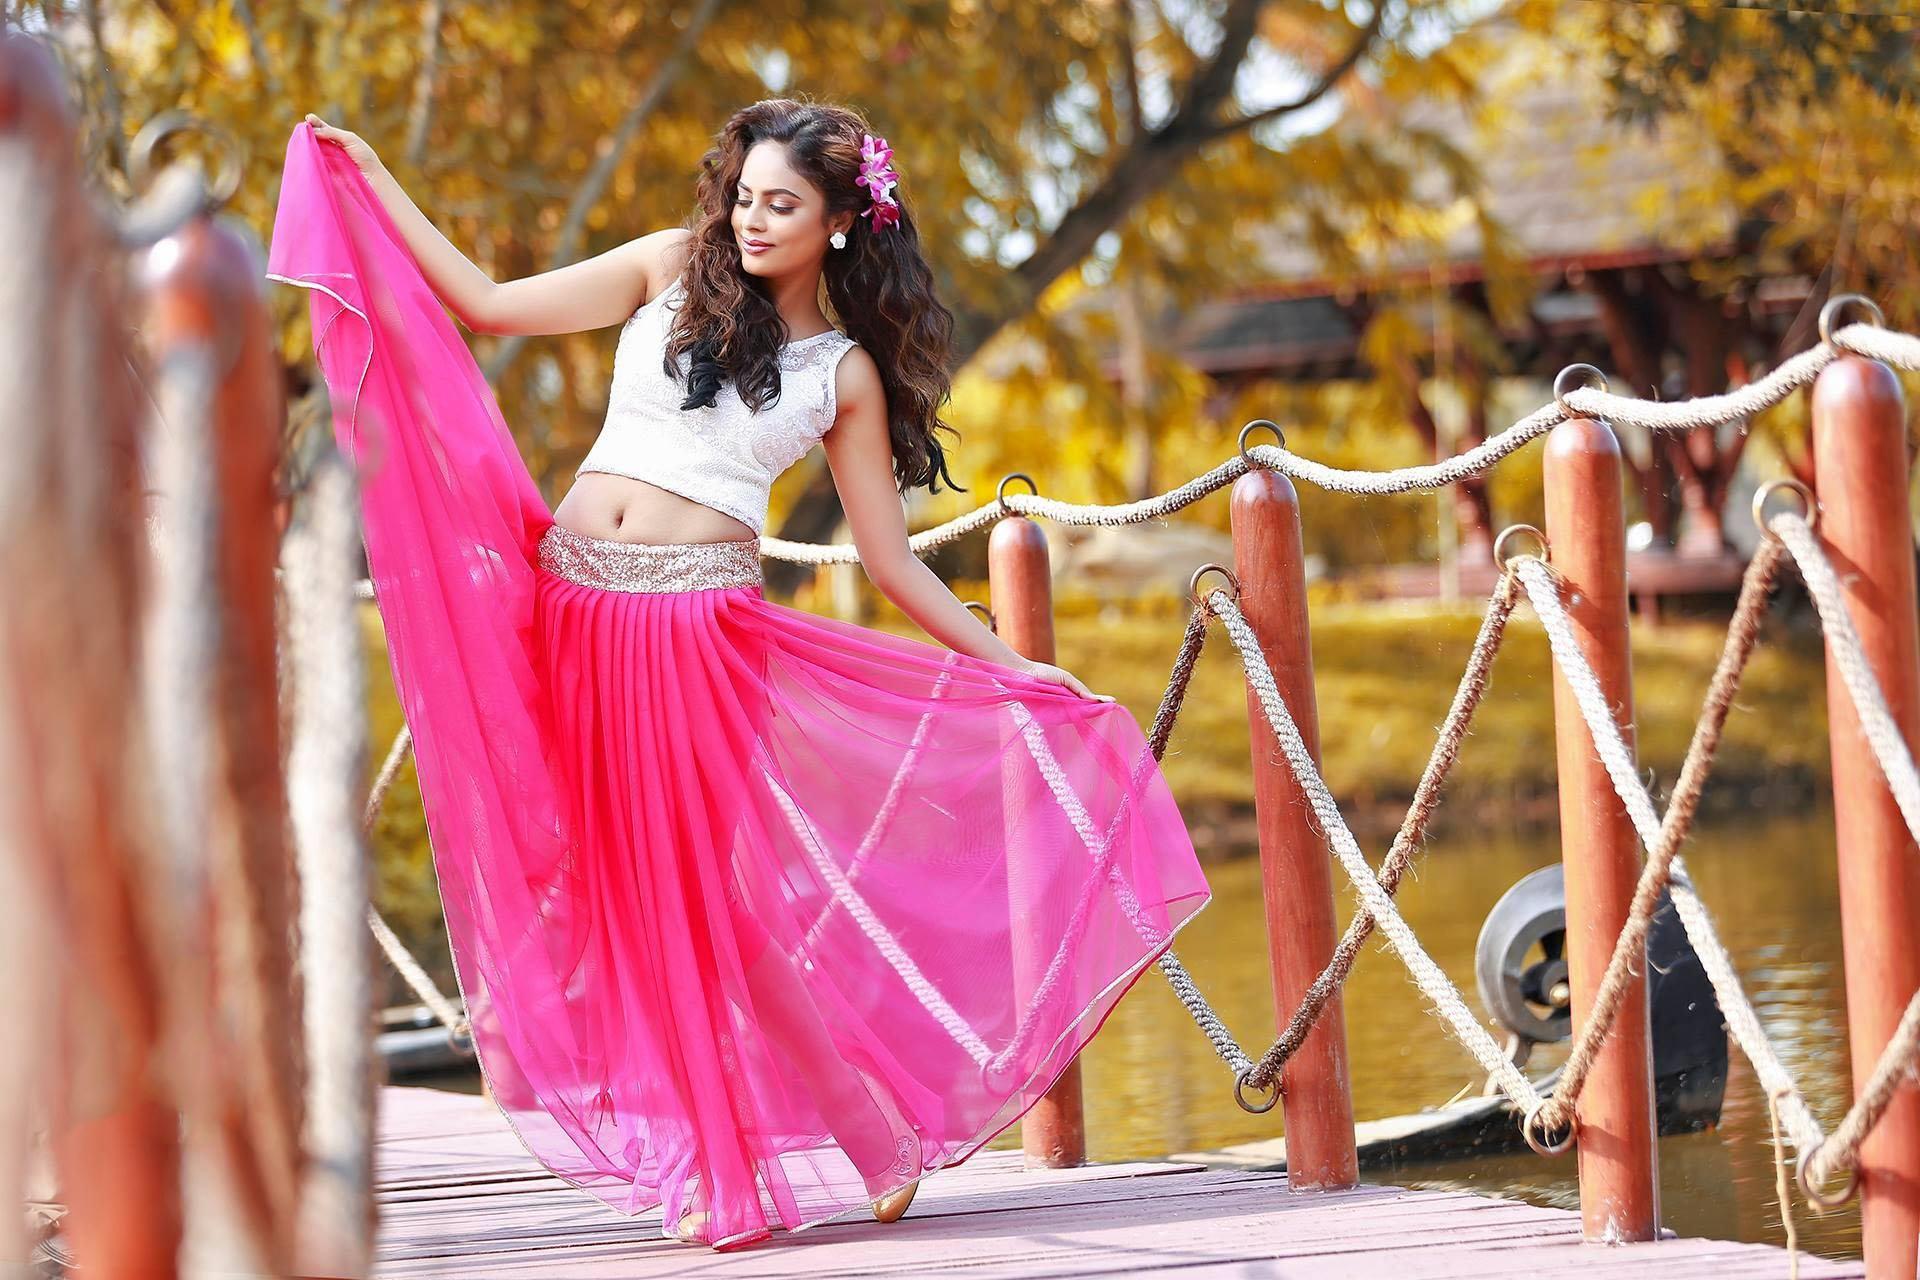 Indian Fashion -shared by Suppa Sri